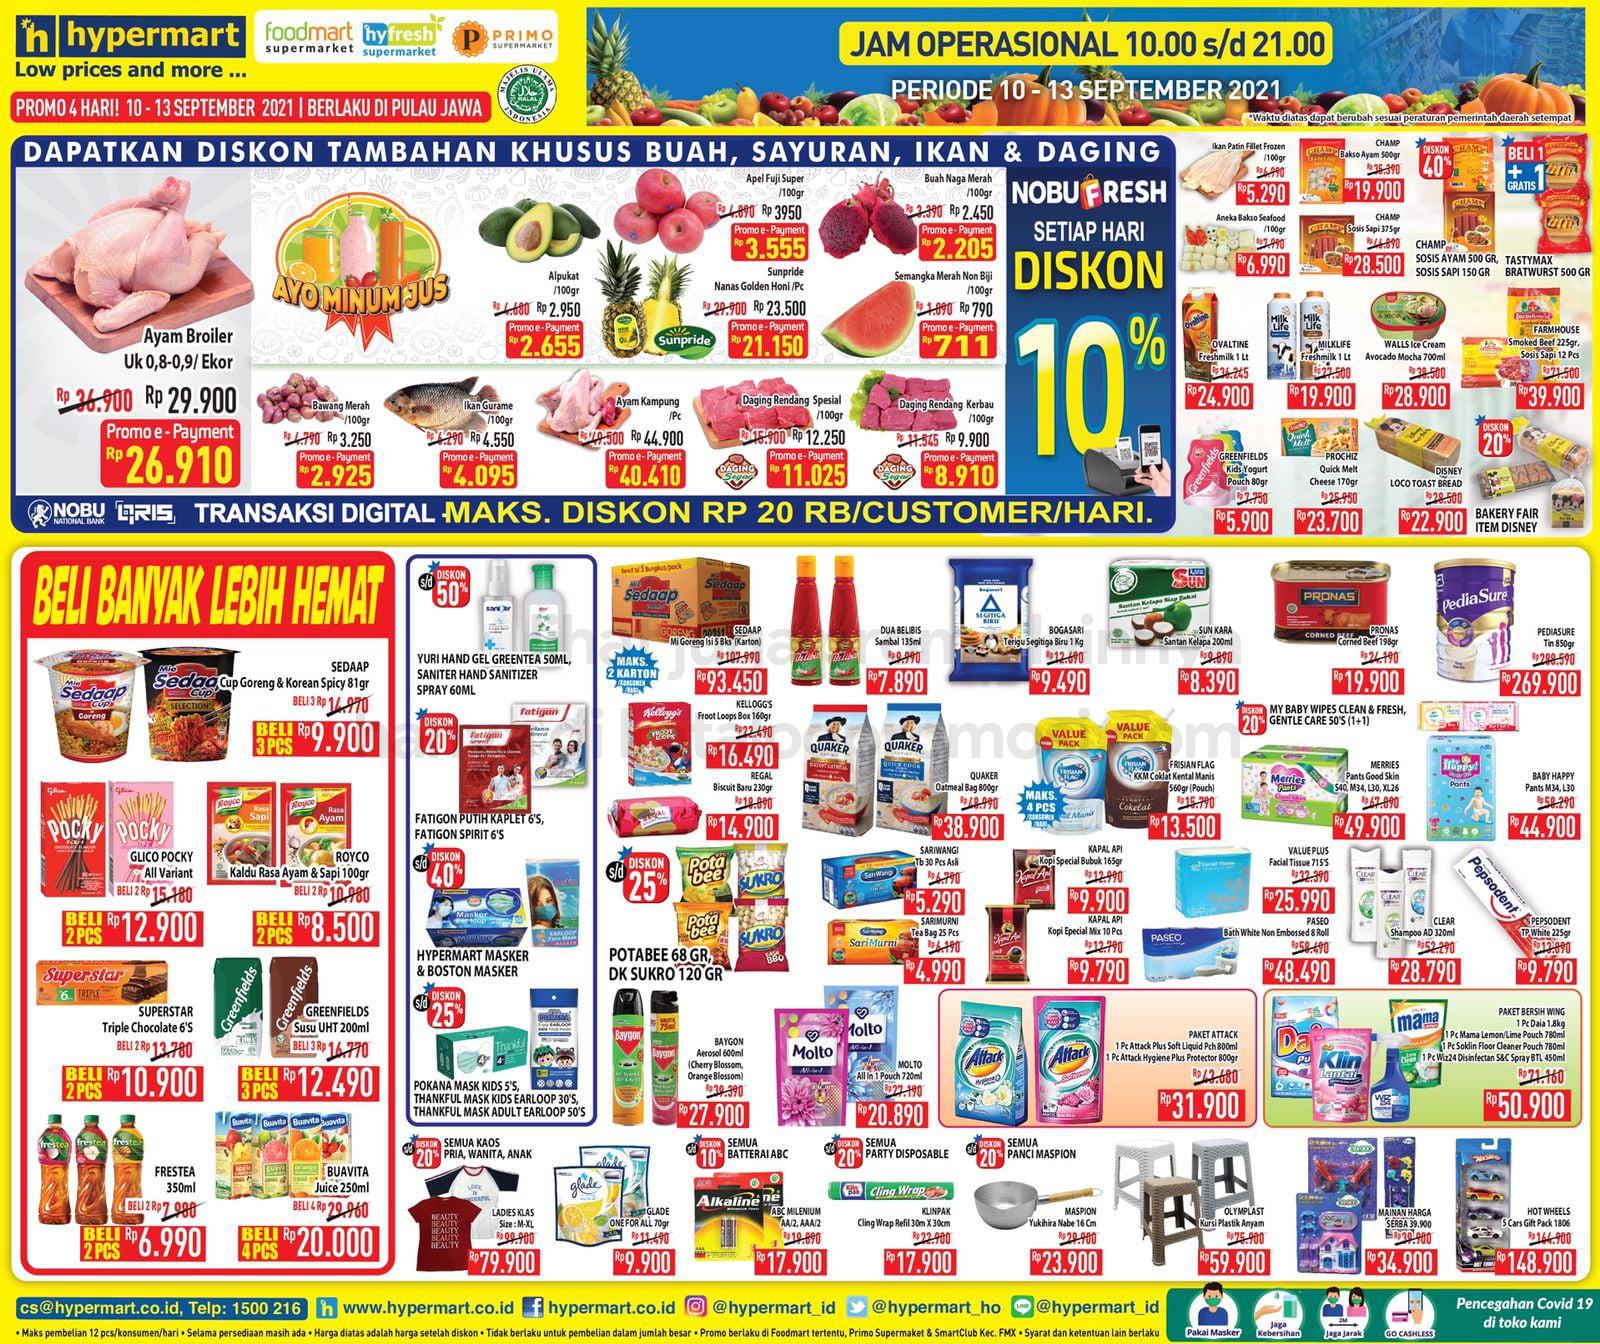 Promo Hypermart JSM Katalog Weekend periode 10-13 September 2021